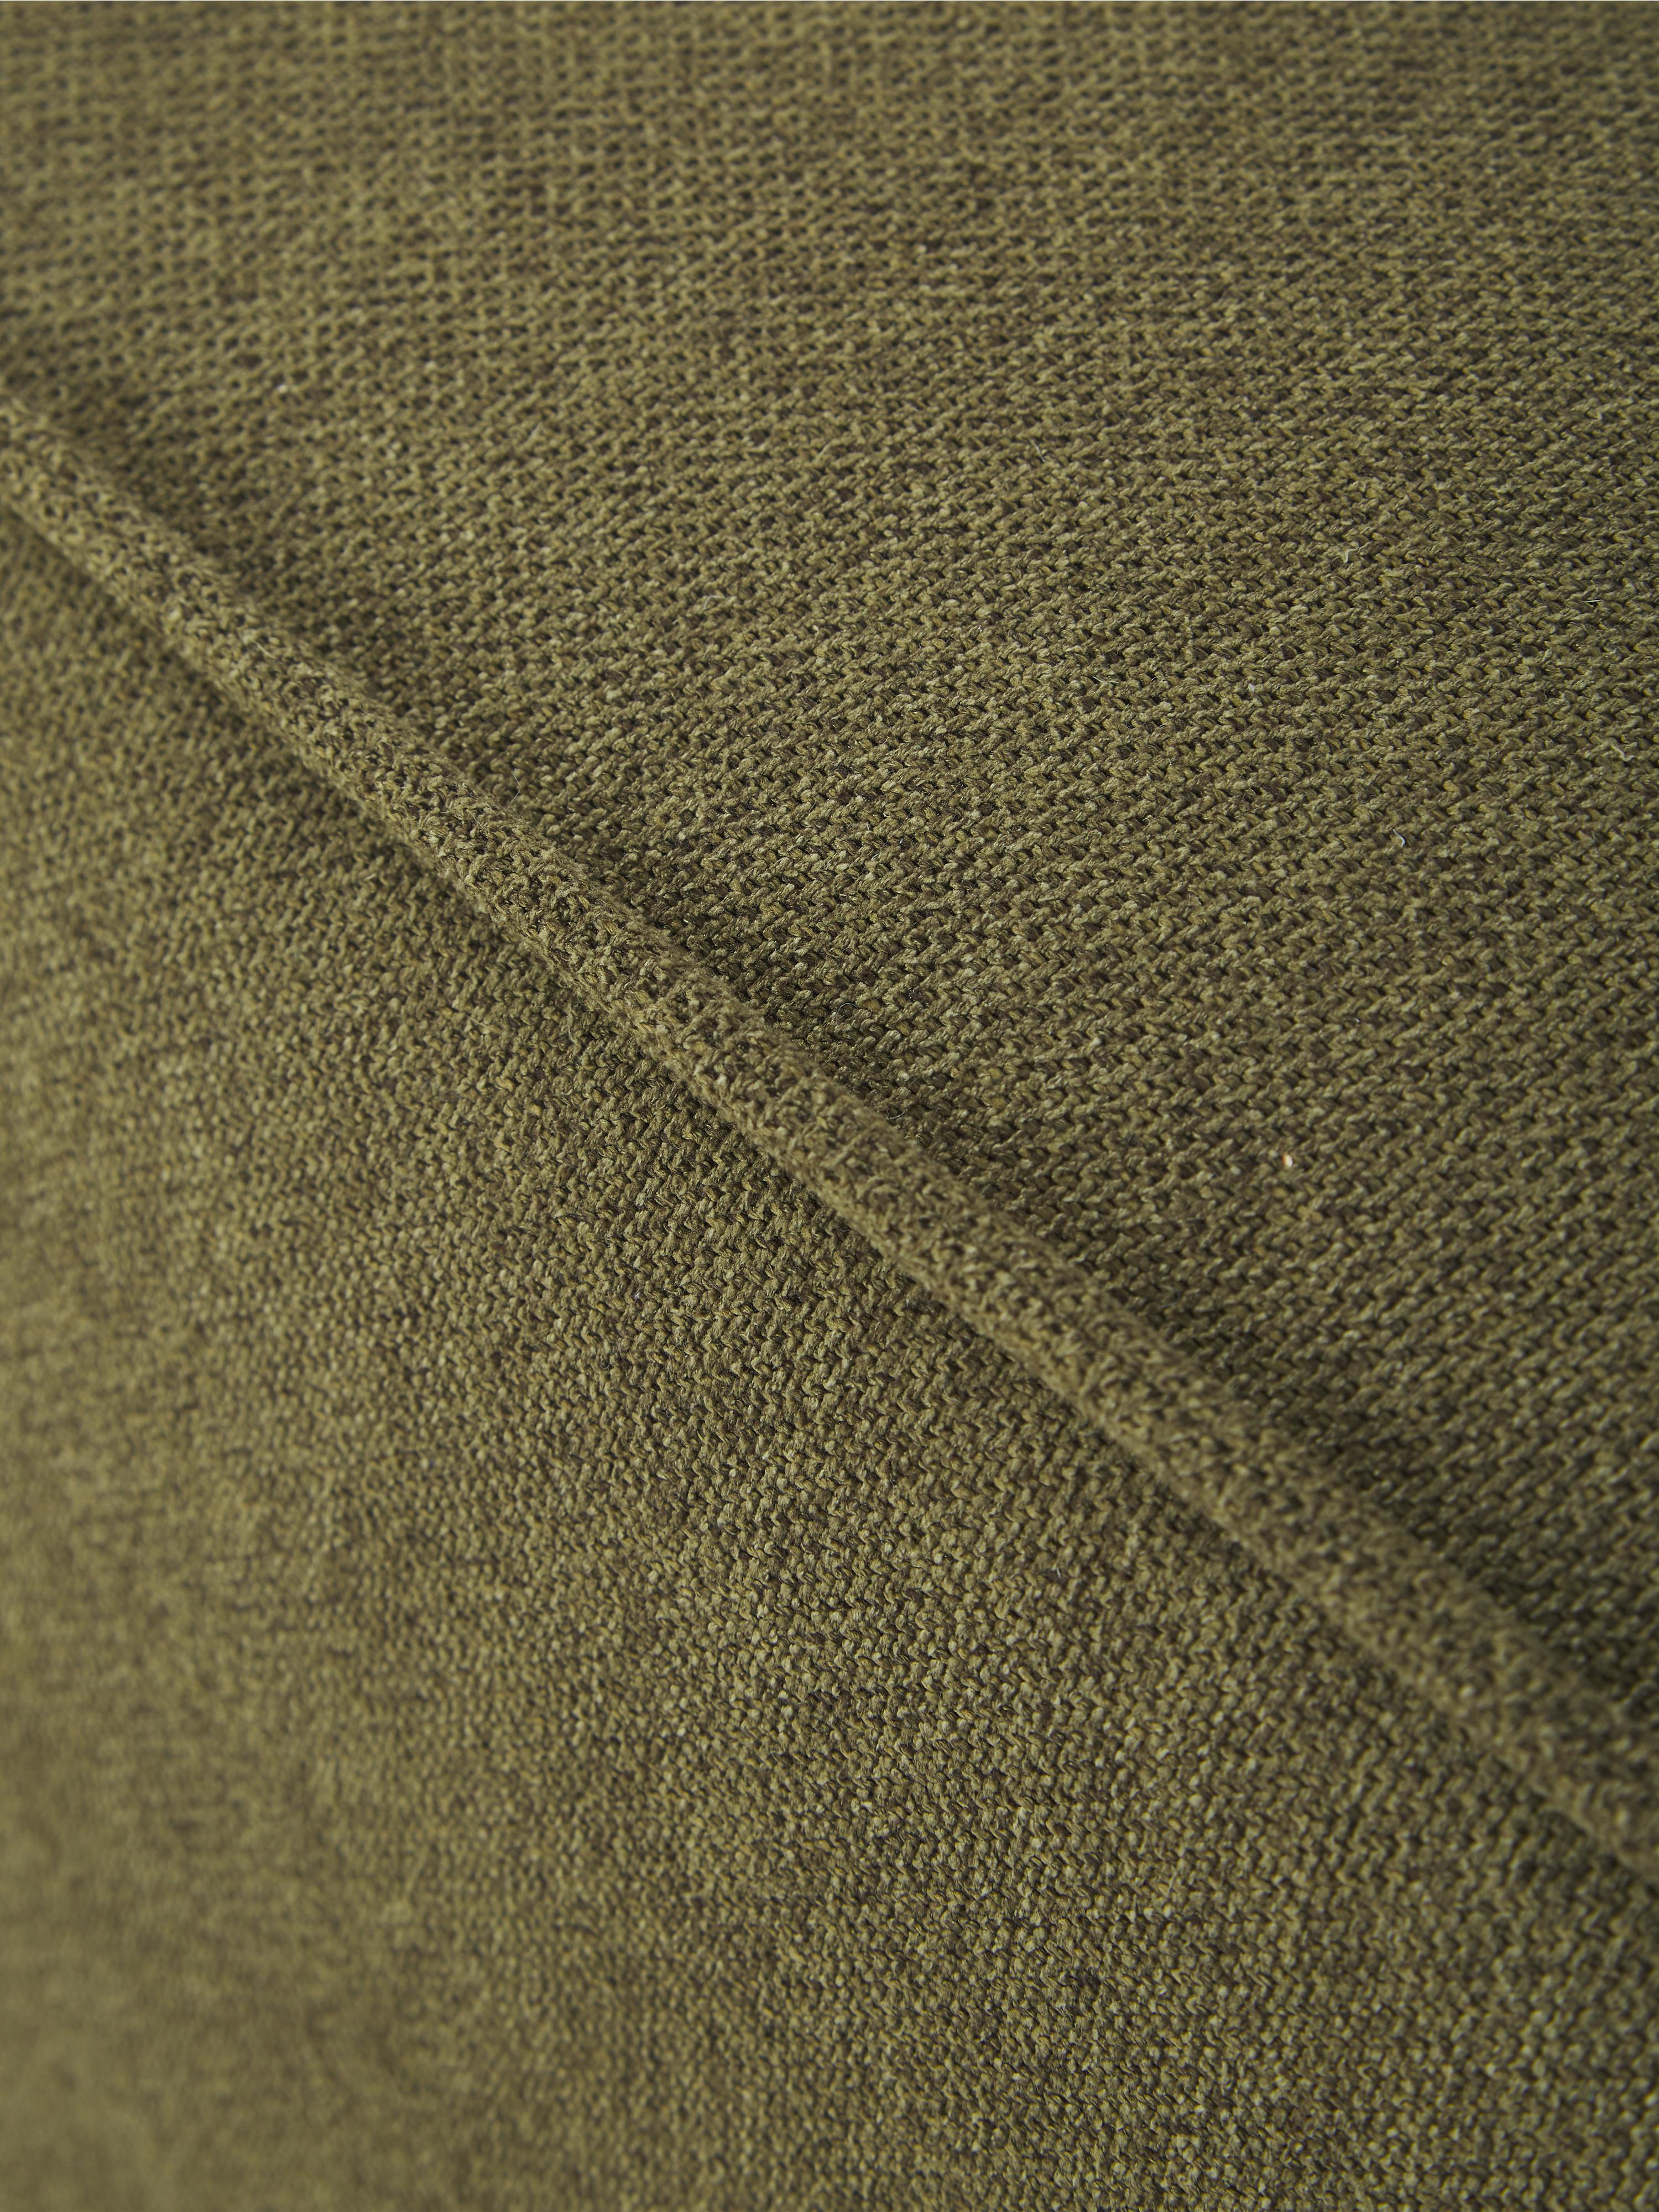 Modulare XL-Ottomane Lennon, Bezug: 100% Polyester Der hochwe, Gestell: Massives Kiefernholz, Spe, Füße: Kunststoff, Webstoff Grün, B 357 x T 119 cm